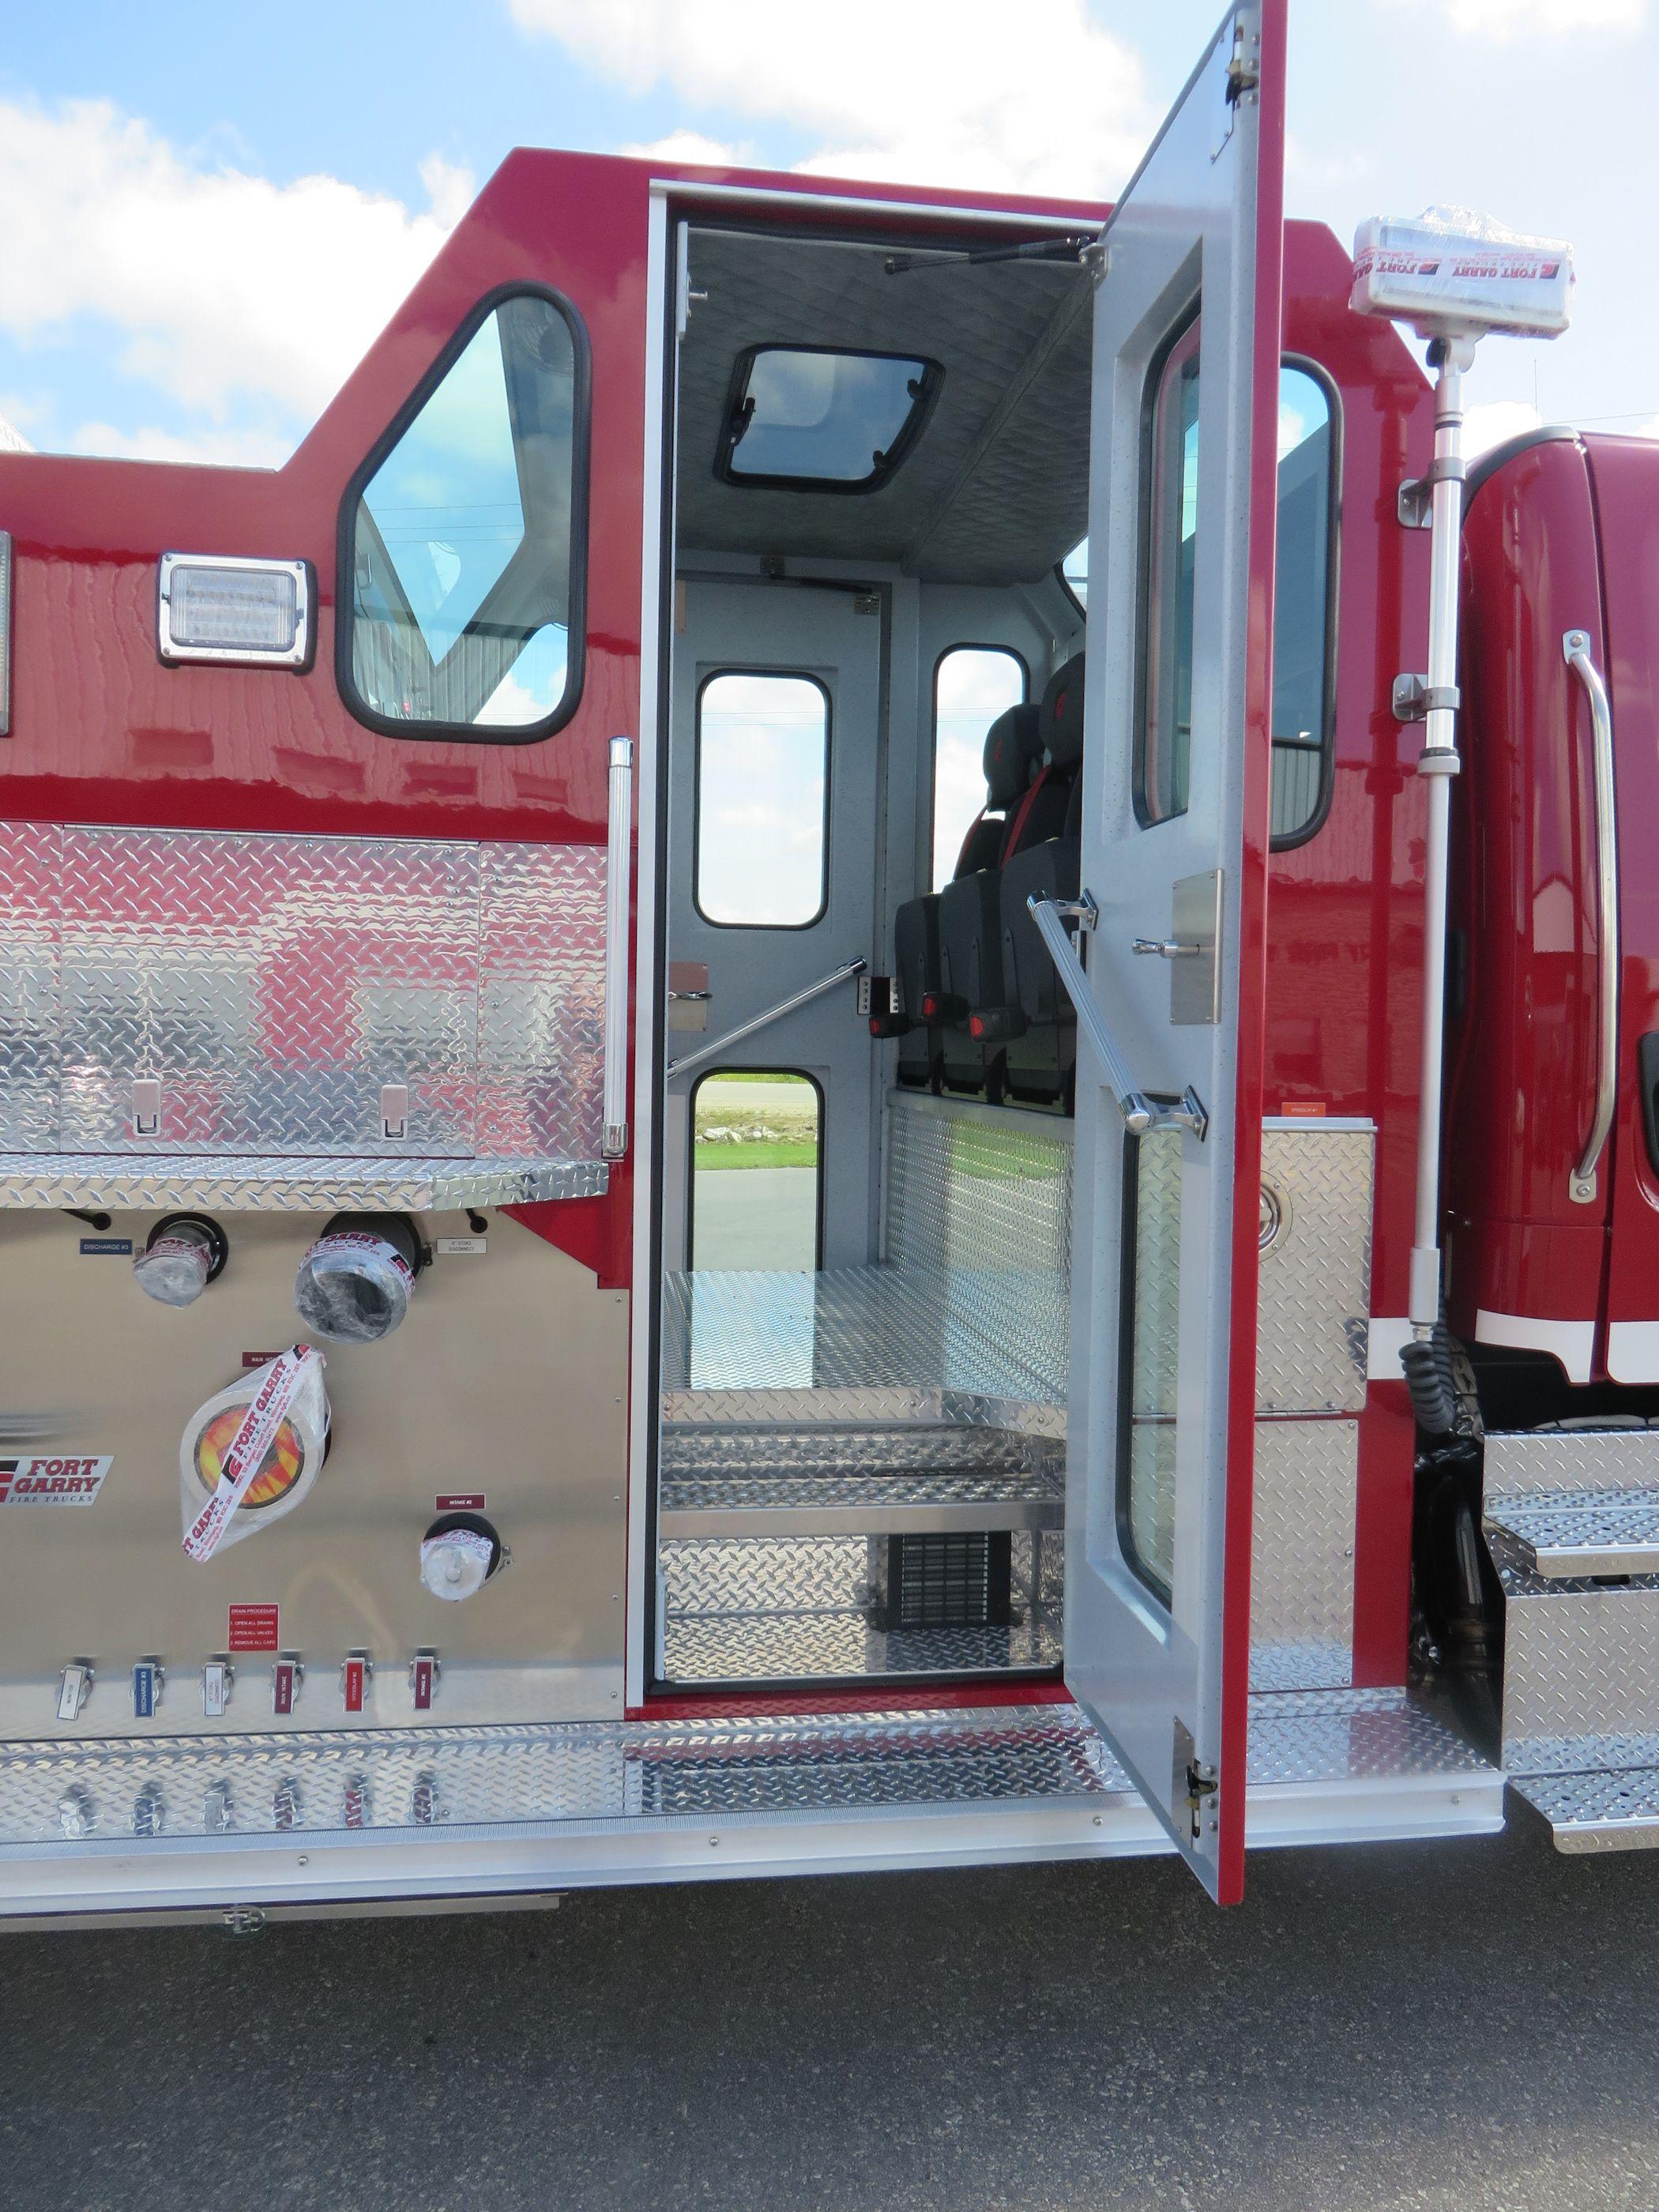 Standard Models Fort Garry Fire Trucks Rescue Engine Pump Panel Diagram Salesman Gil Bradet Nordique Protection1412 Centennial Street Whitehorse Yukonphone 867 333 35363email Nordiquenorthwestelnet